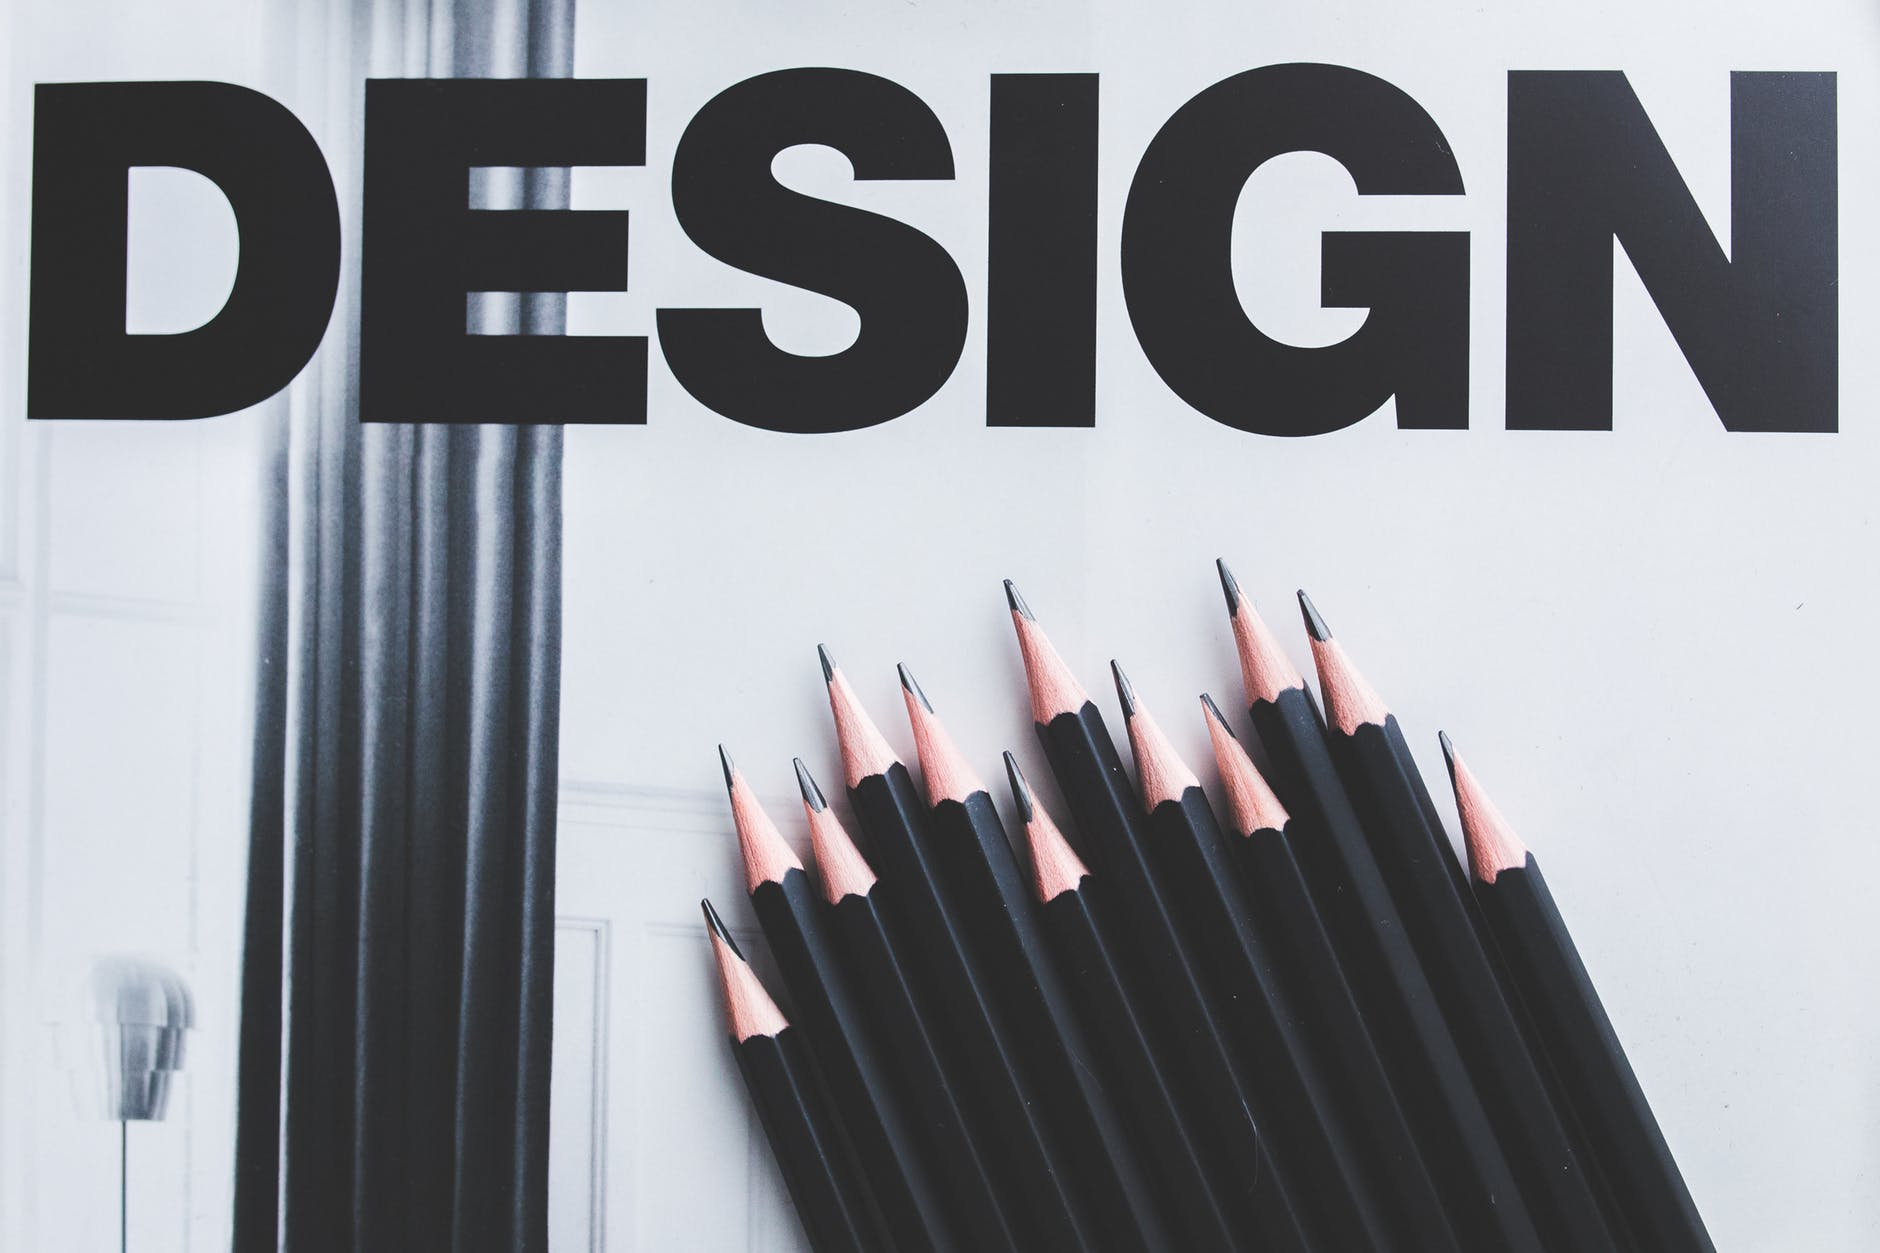 - brand identity and design